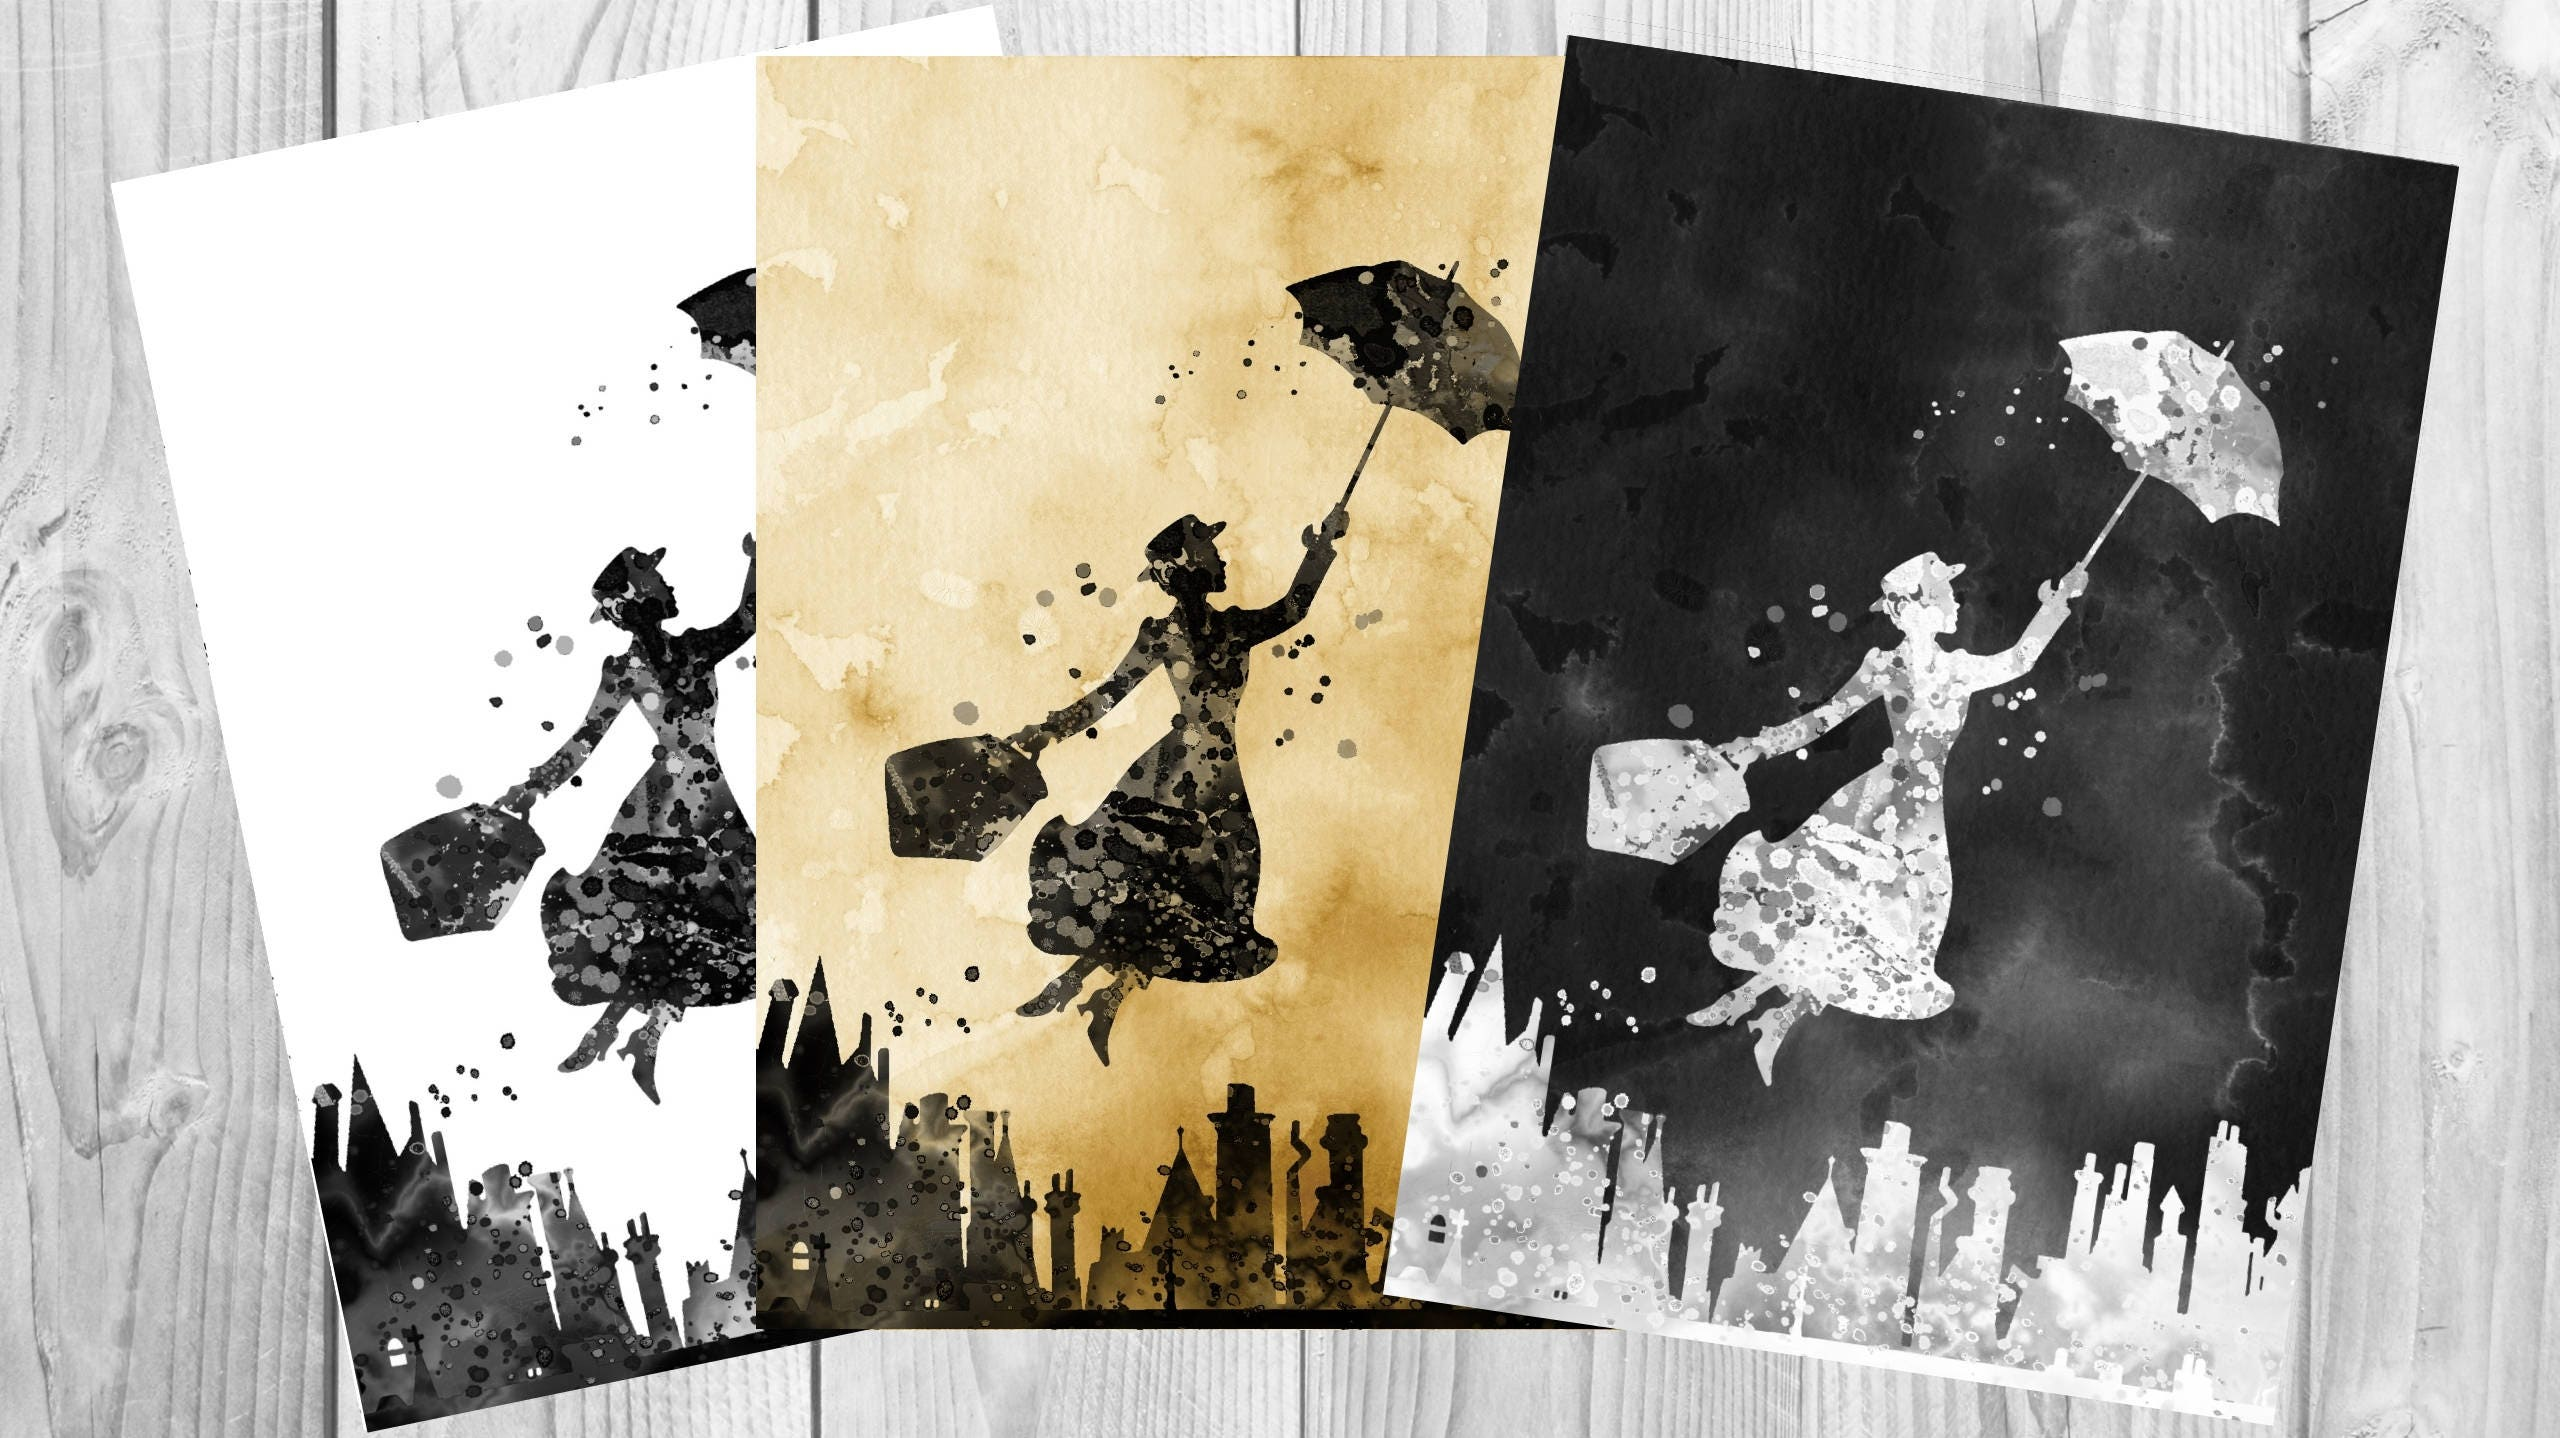 Mary Poppins Poster Art Print Wall Decor Instant Digital